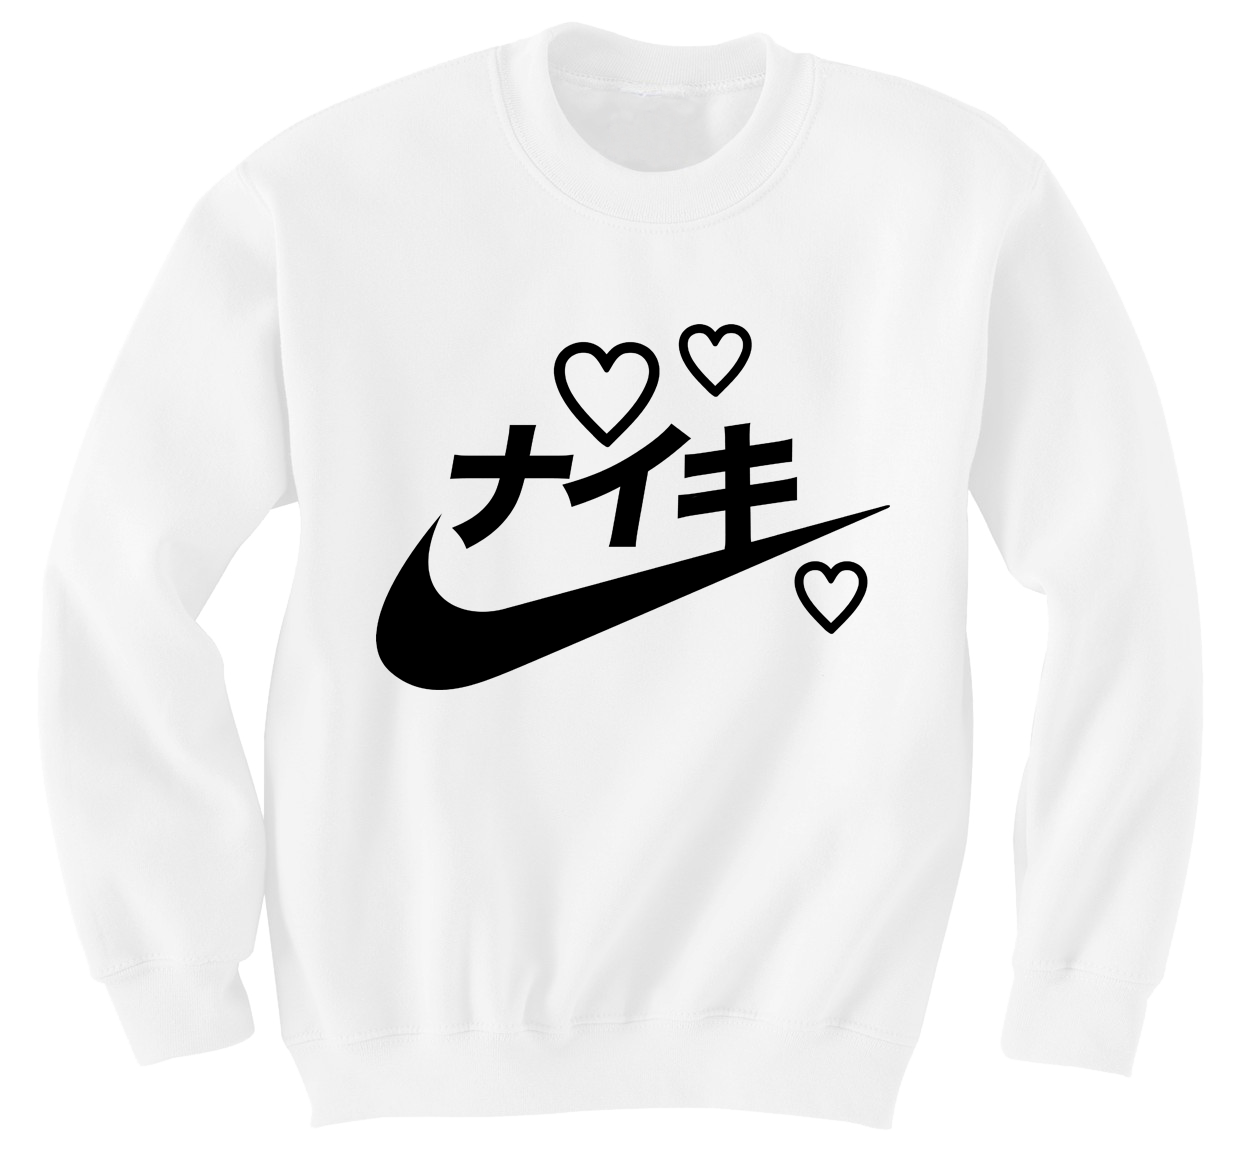 nike-adidas-naiki-5-sweater-sweatshirt-fleece-crewneck-adidasu-2-naiku-japanese-letters-katakana-kawaii-cute-white-black-t-shirt-tee-inu-inuinu-shopinuinu-sport-logo-heart-brand_original